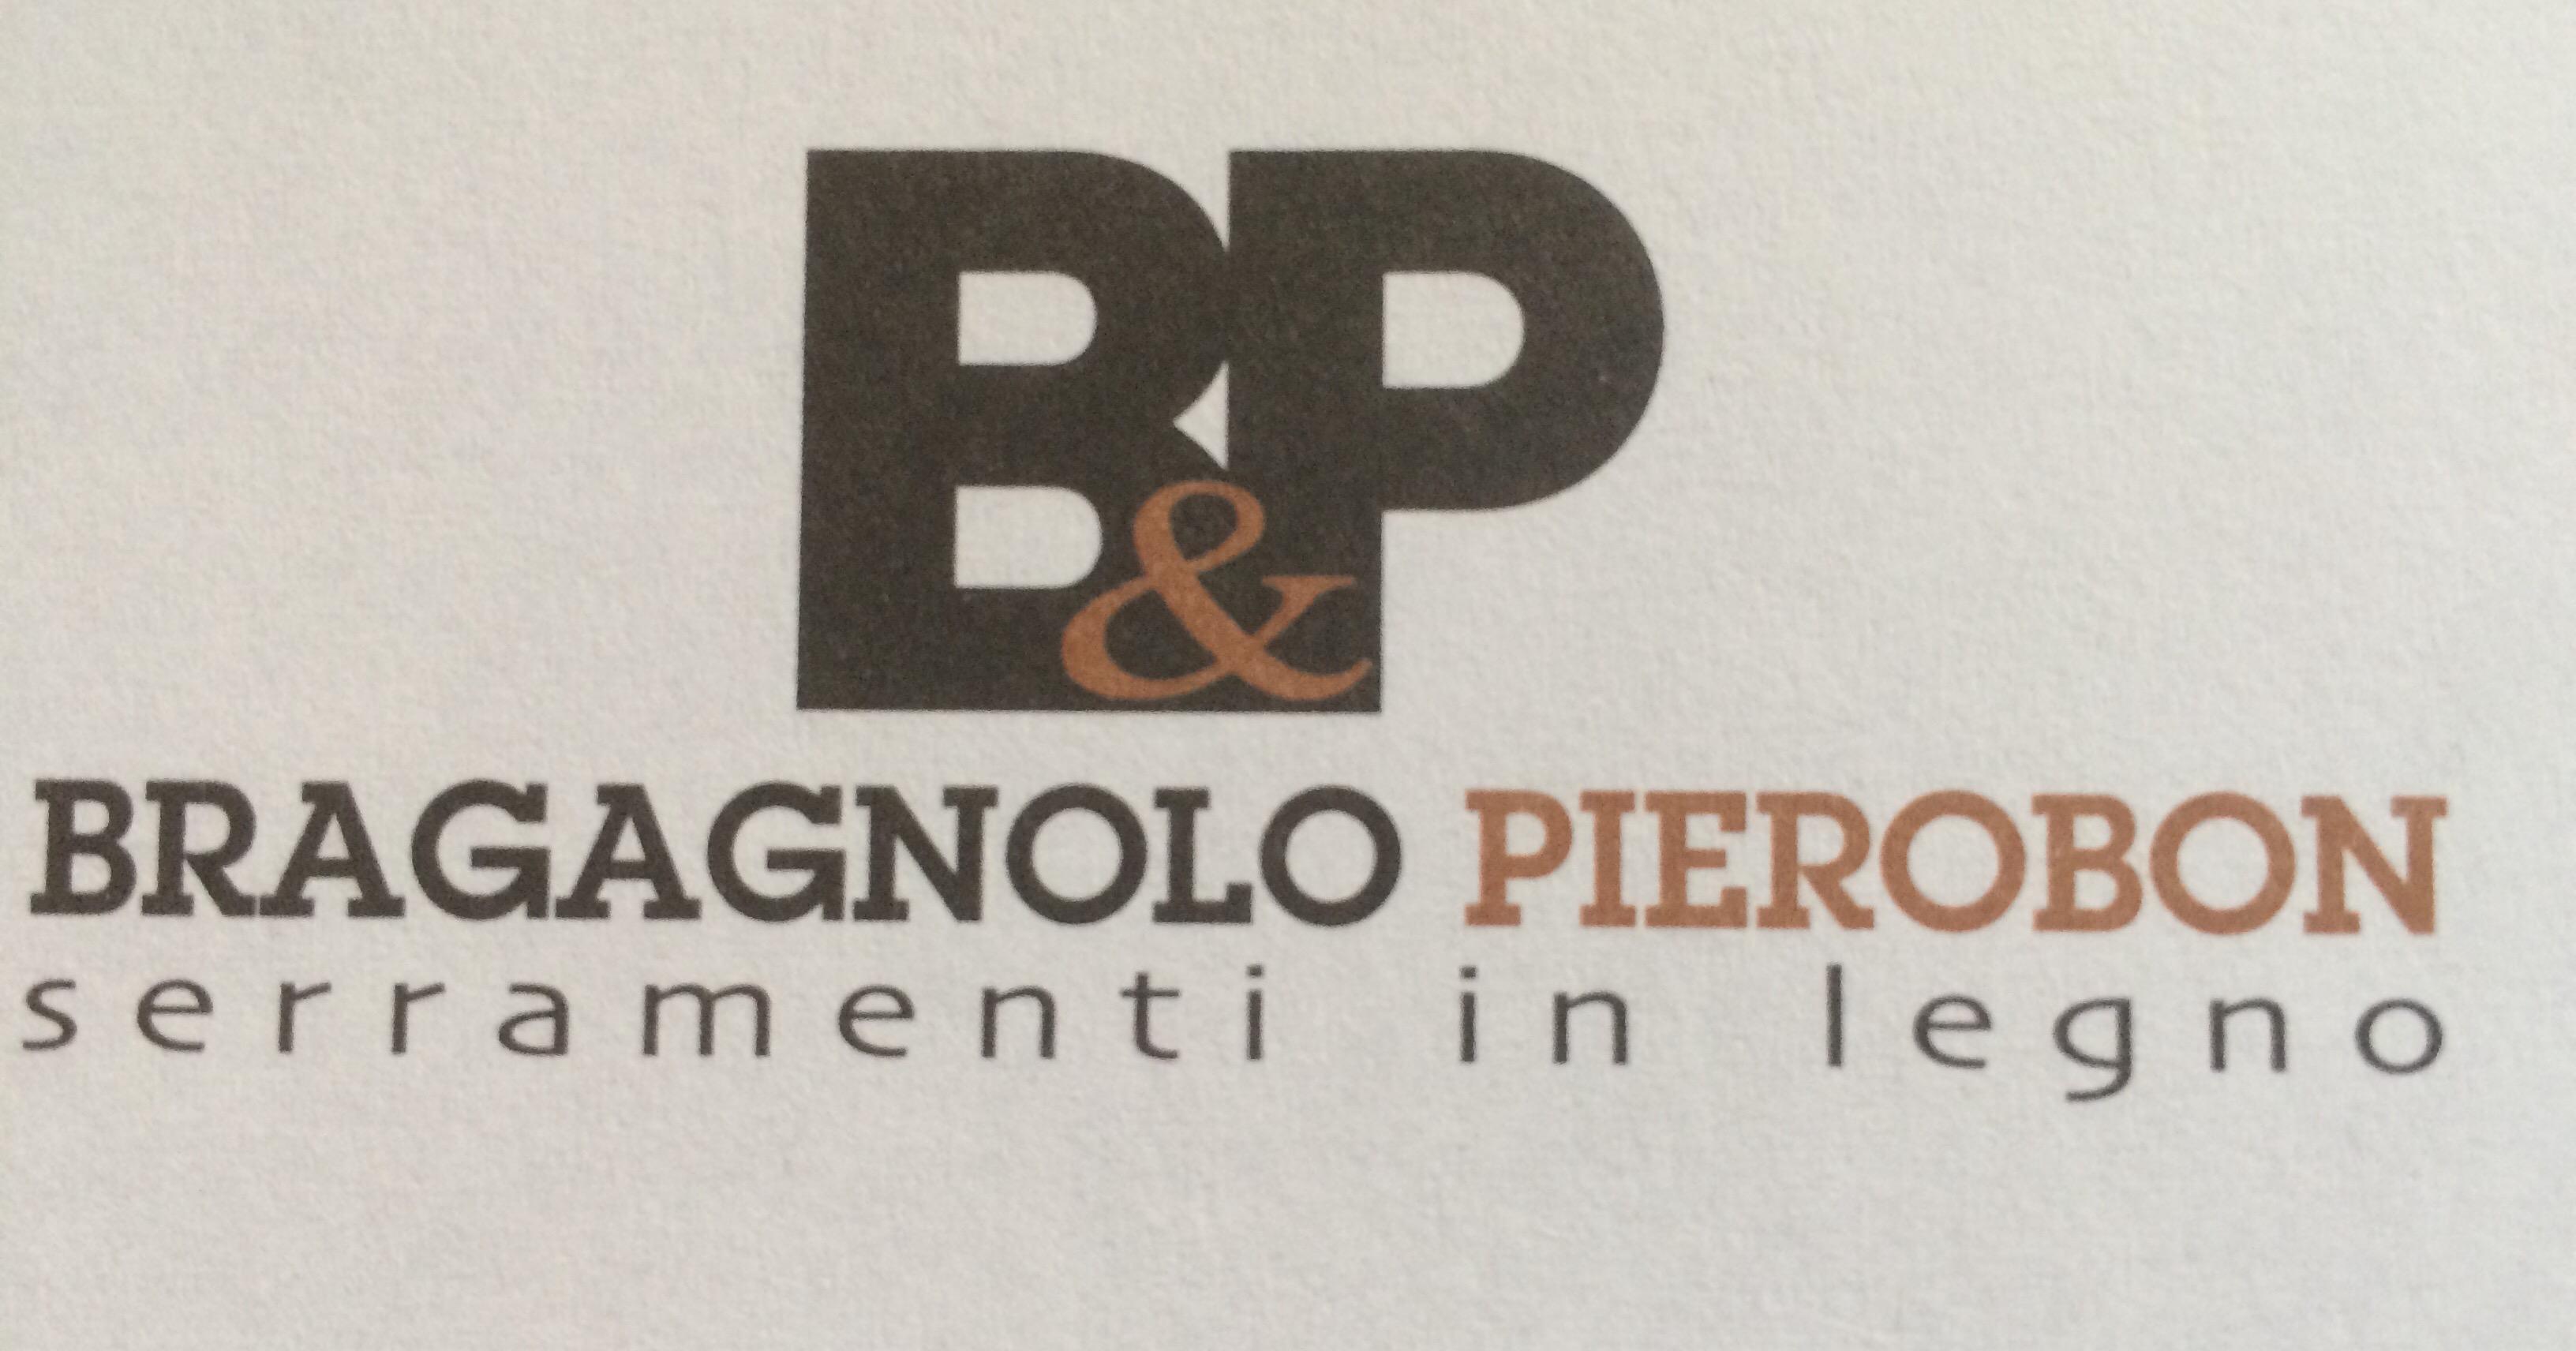 Falegnameria Bragagnolo E Pierobon Sas